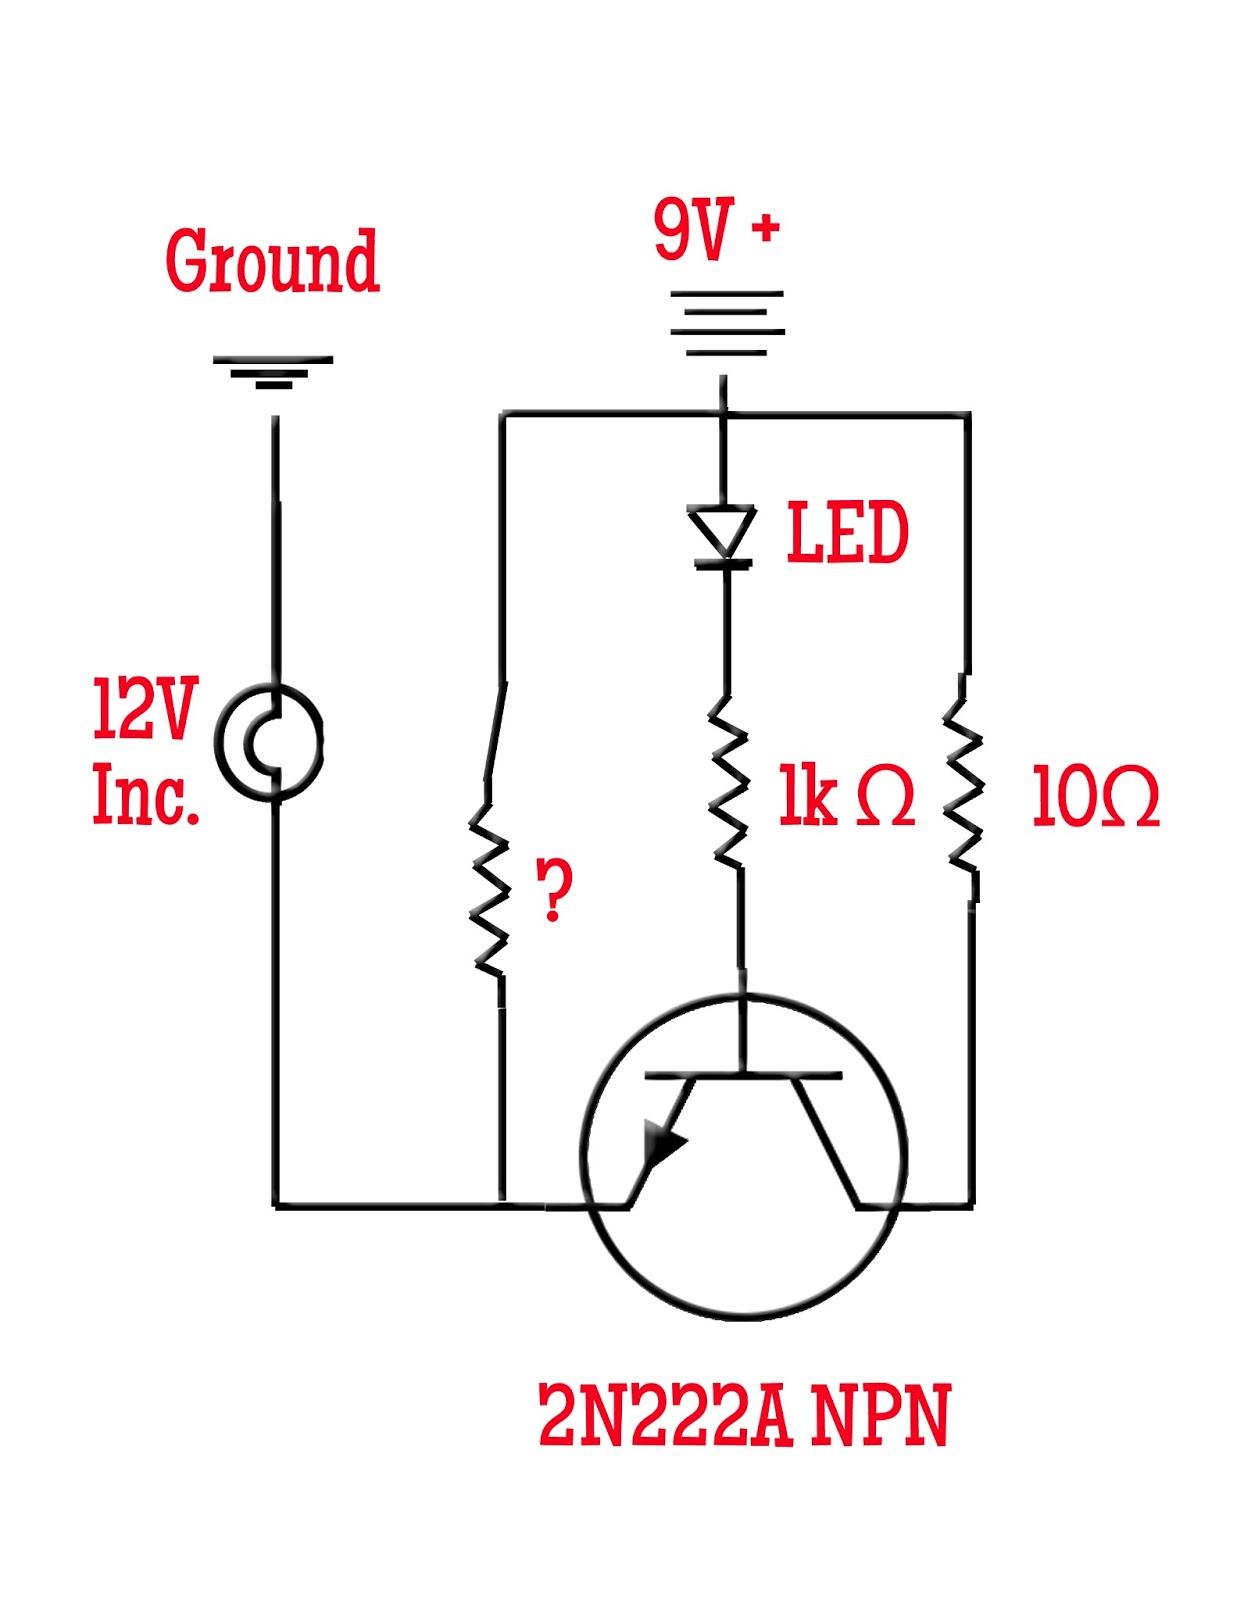 blinking led ckt diagram [ 1237 x 1600 Pixel ]